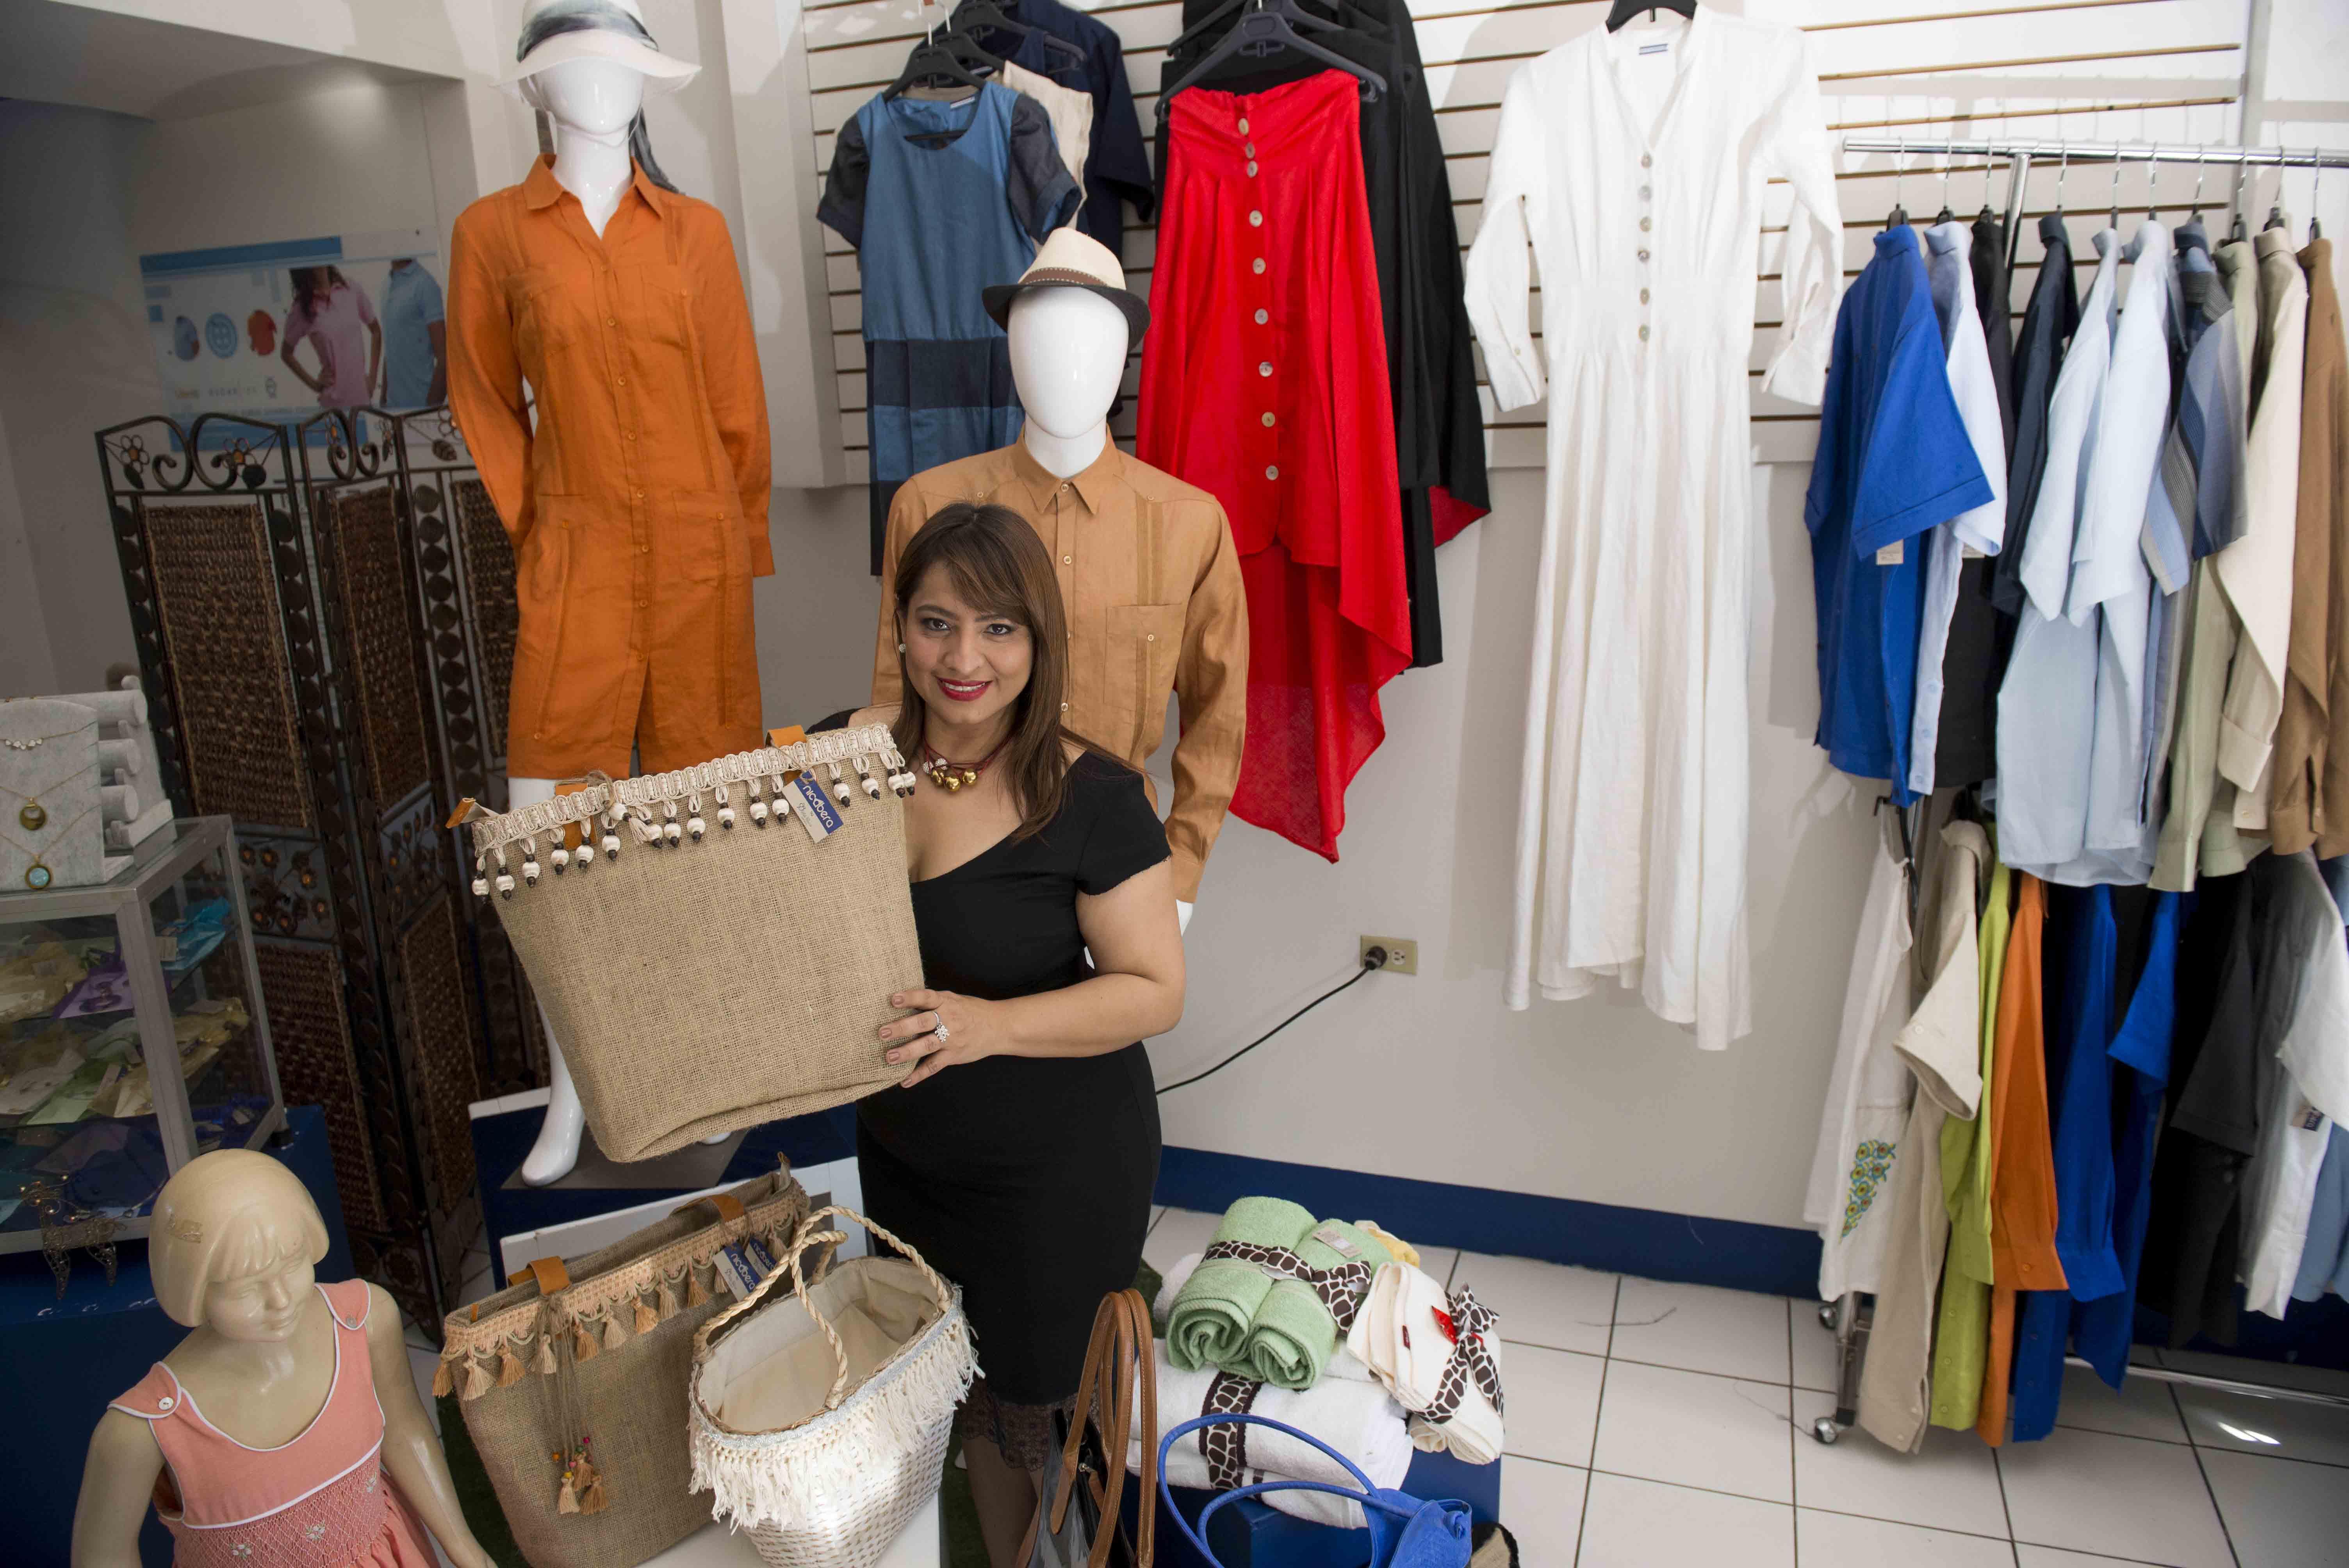 bb5cc6b2a2 El negocio de la ropa usada - La Prensa